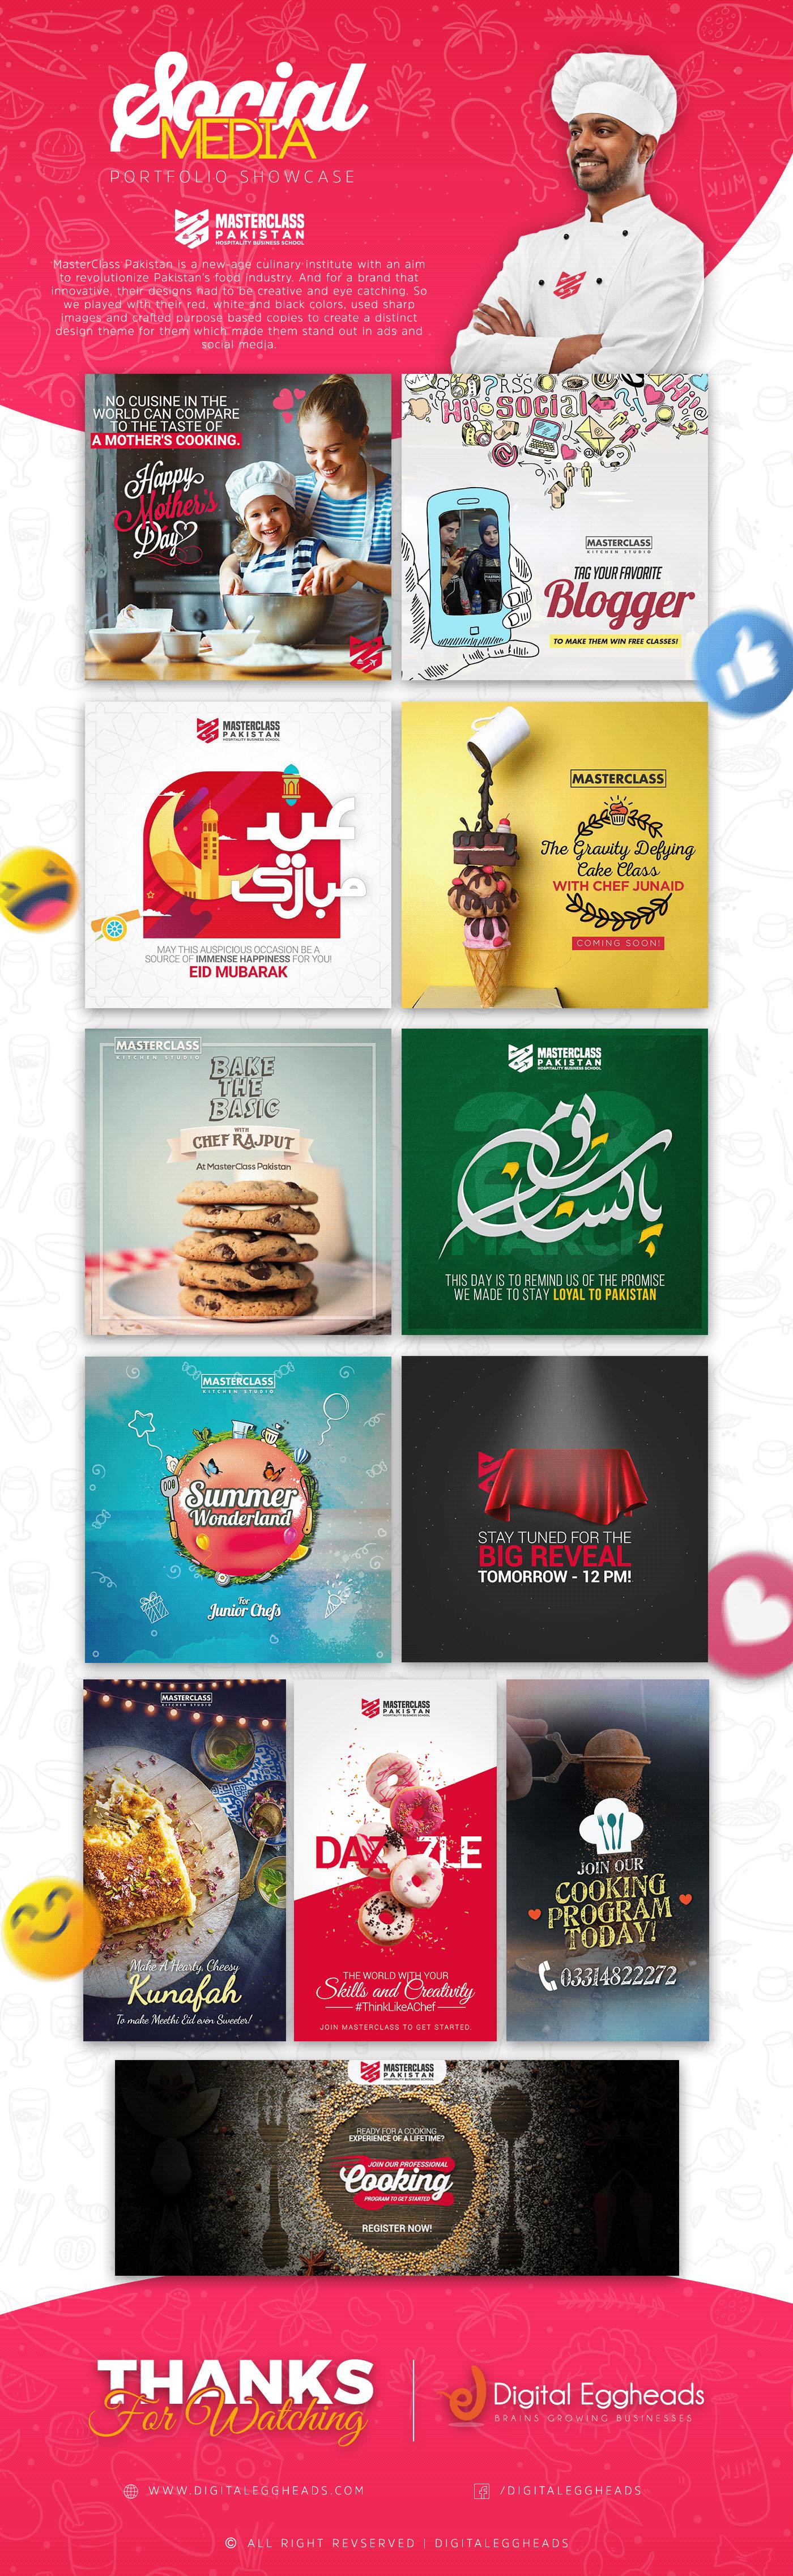 masterclass pakistan pakistan design agency design agency karachi institute design school artwork Social Media Design social media digital marketing graphic design